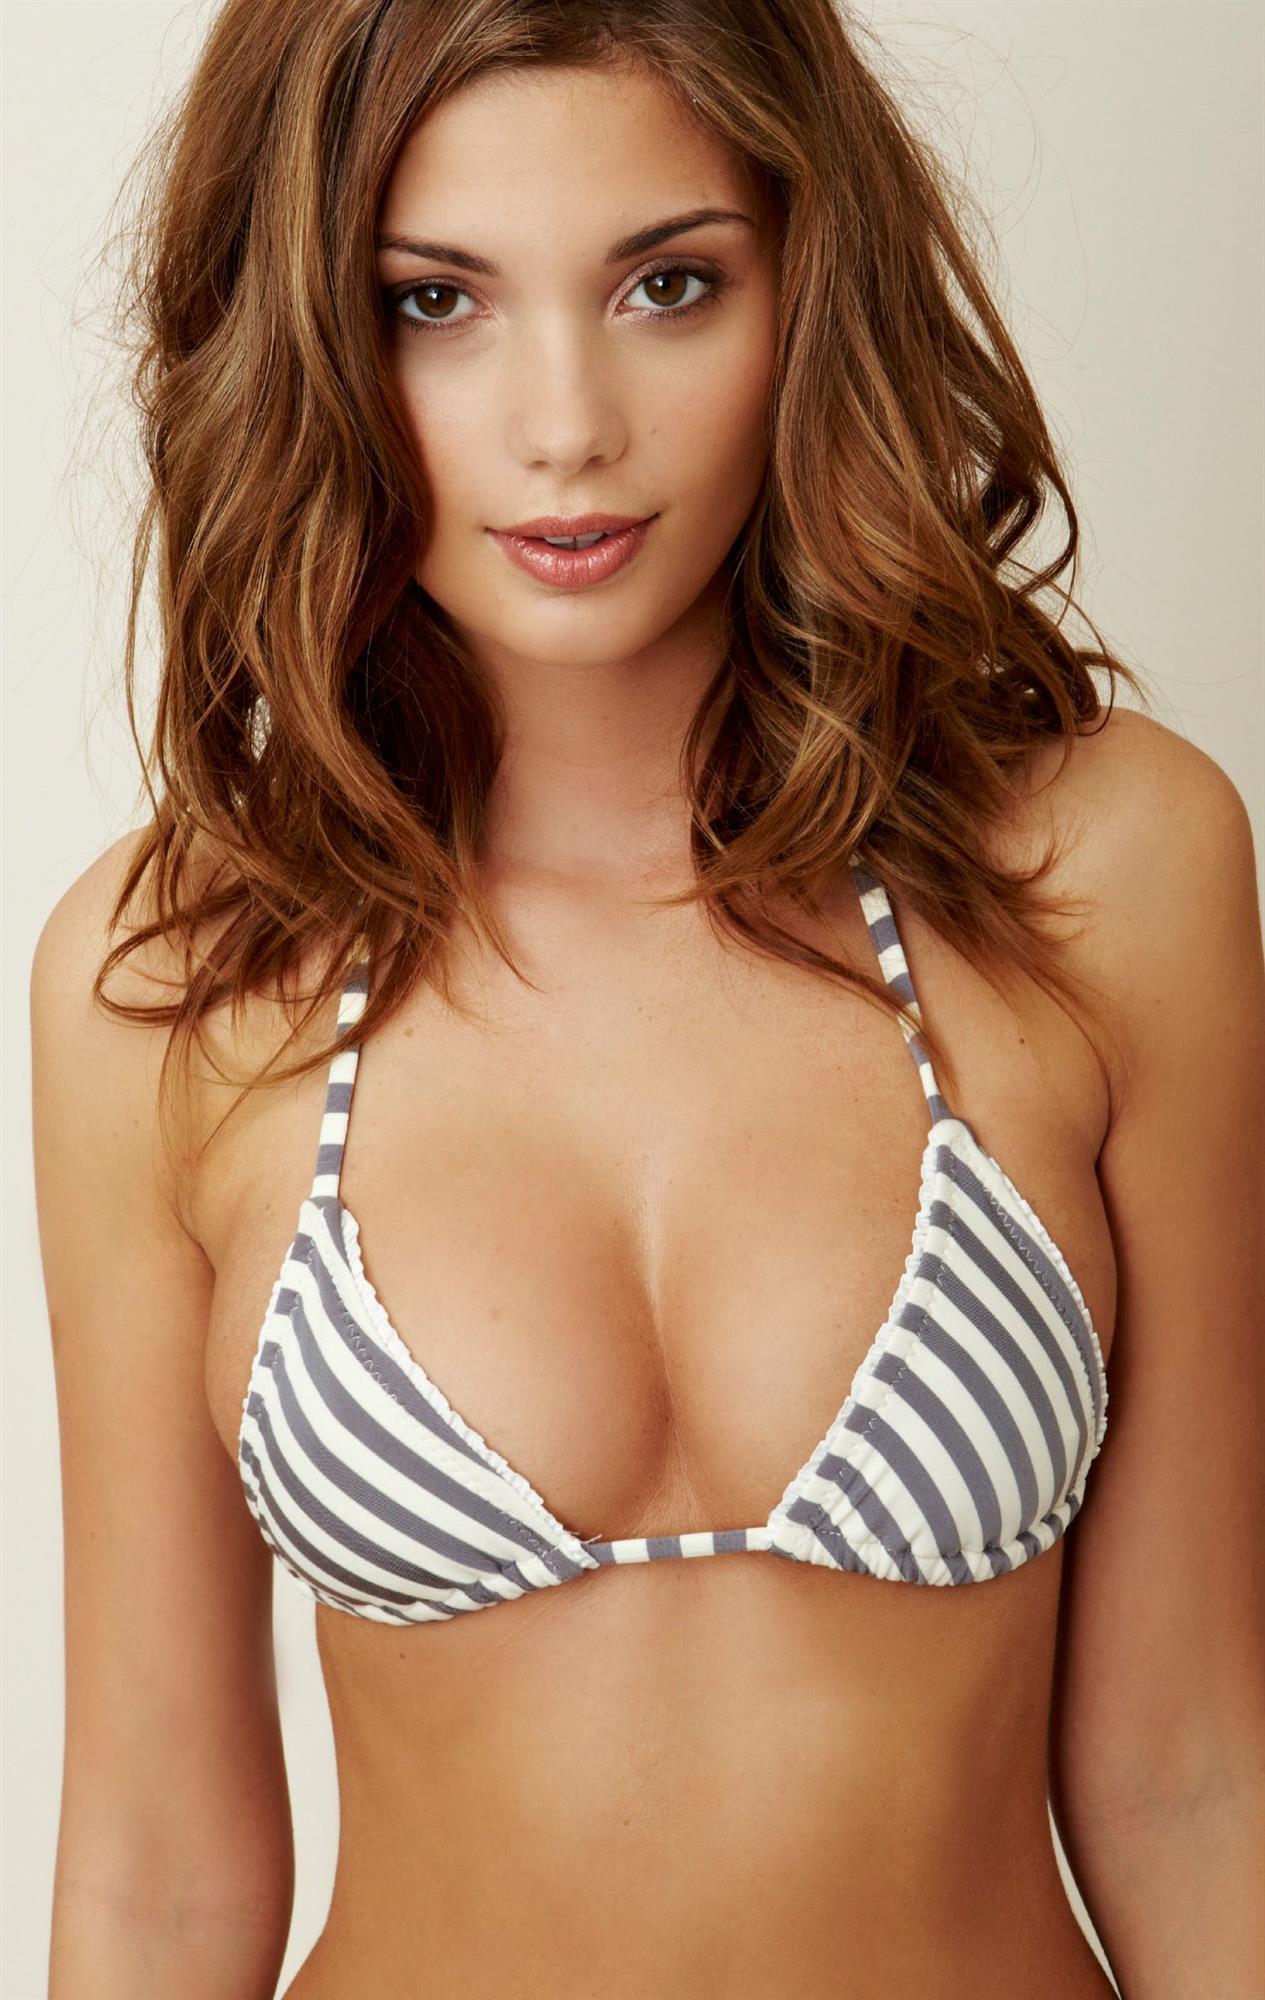 Terra Jo Wallace in a bikini